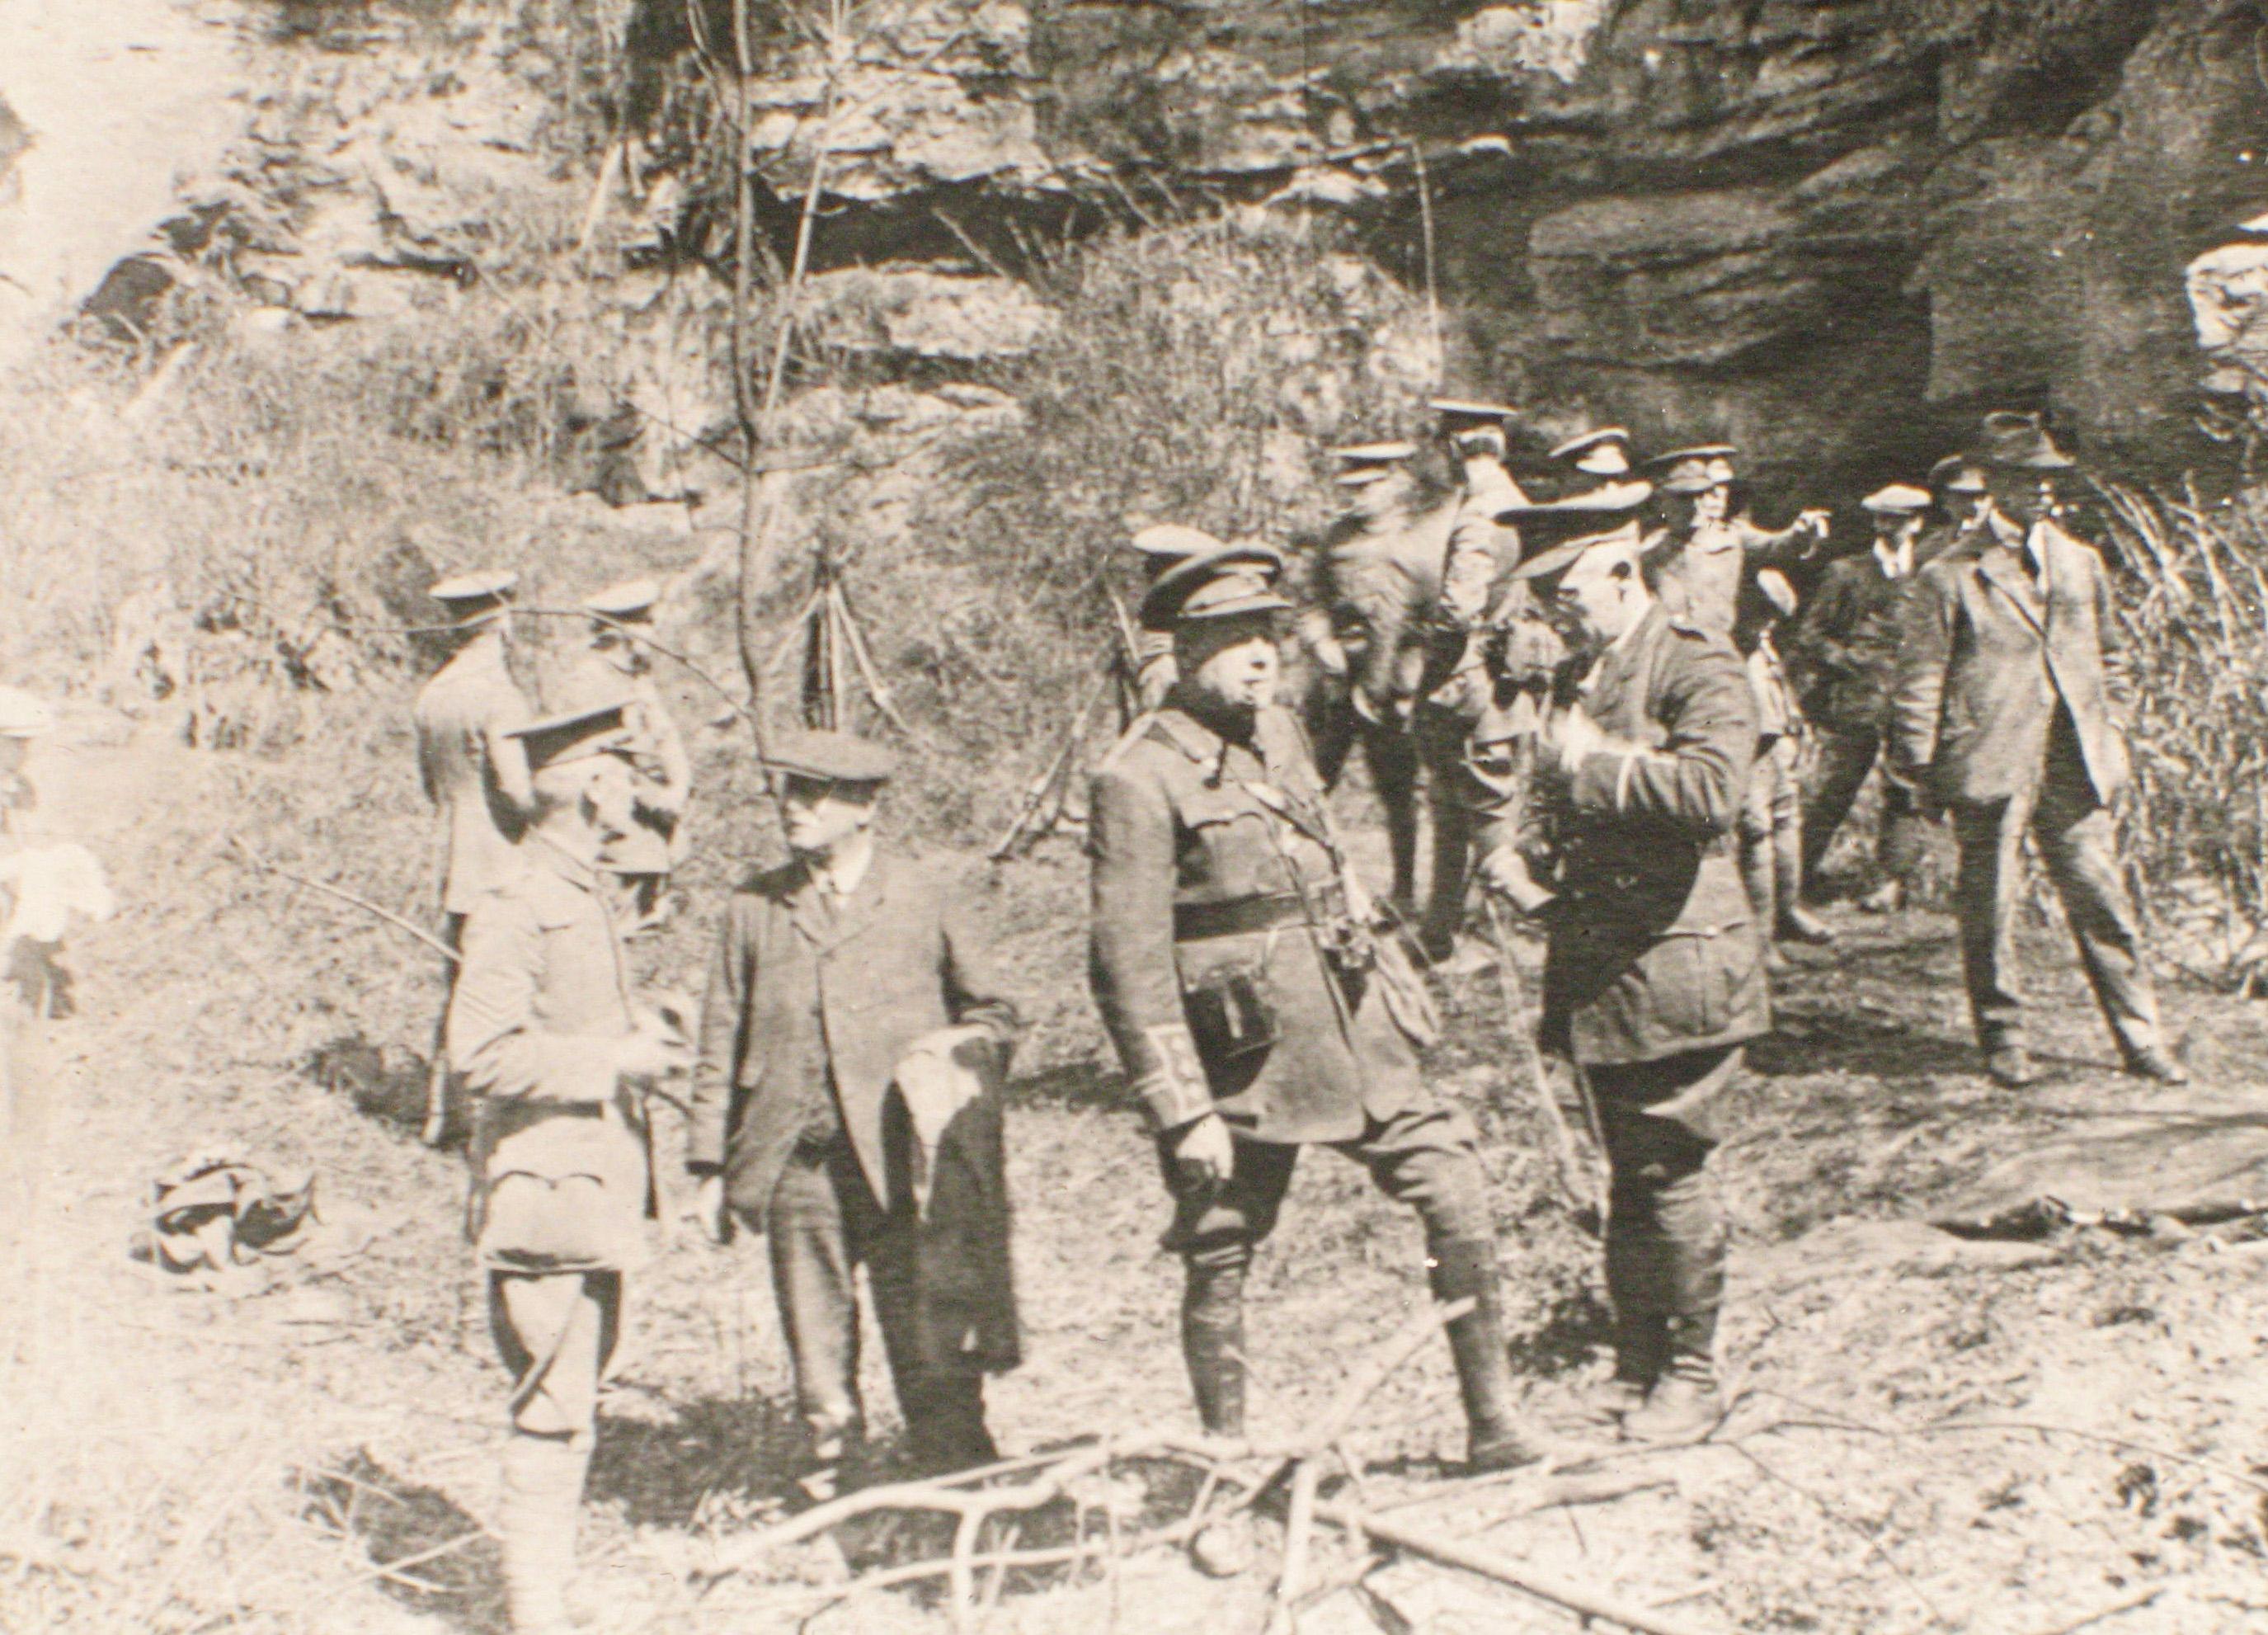 On Harborne Rifle Range